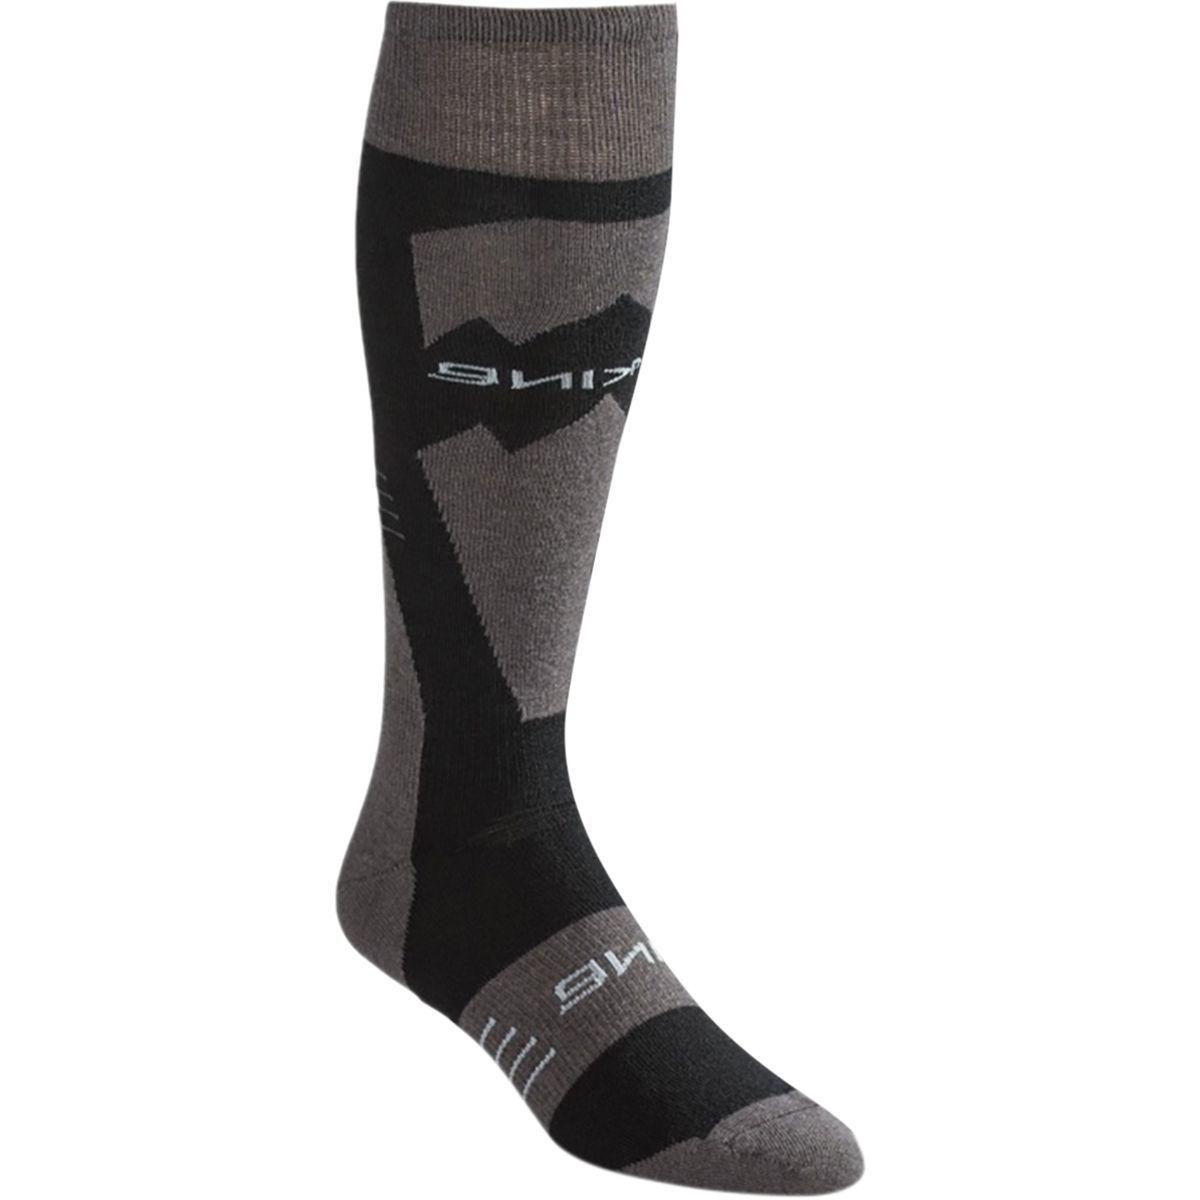 DAKINE Summit Sock - Men's